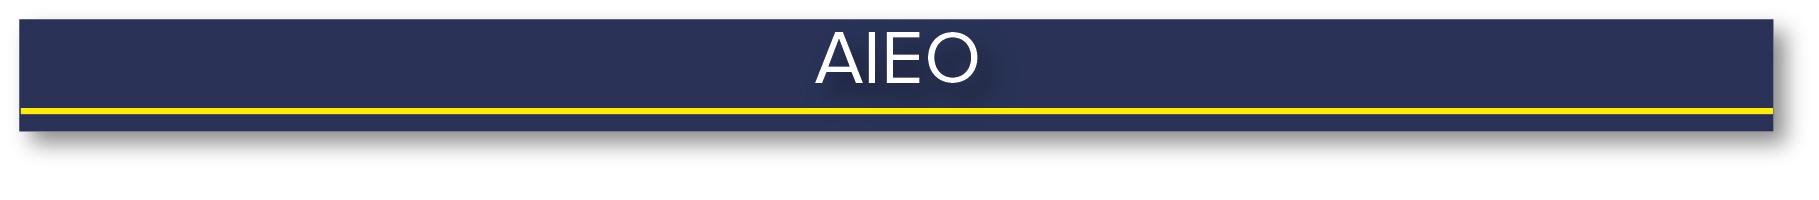 AIEO heading.jpg